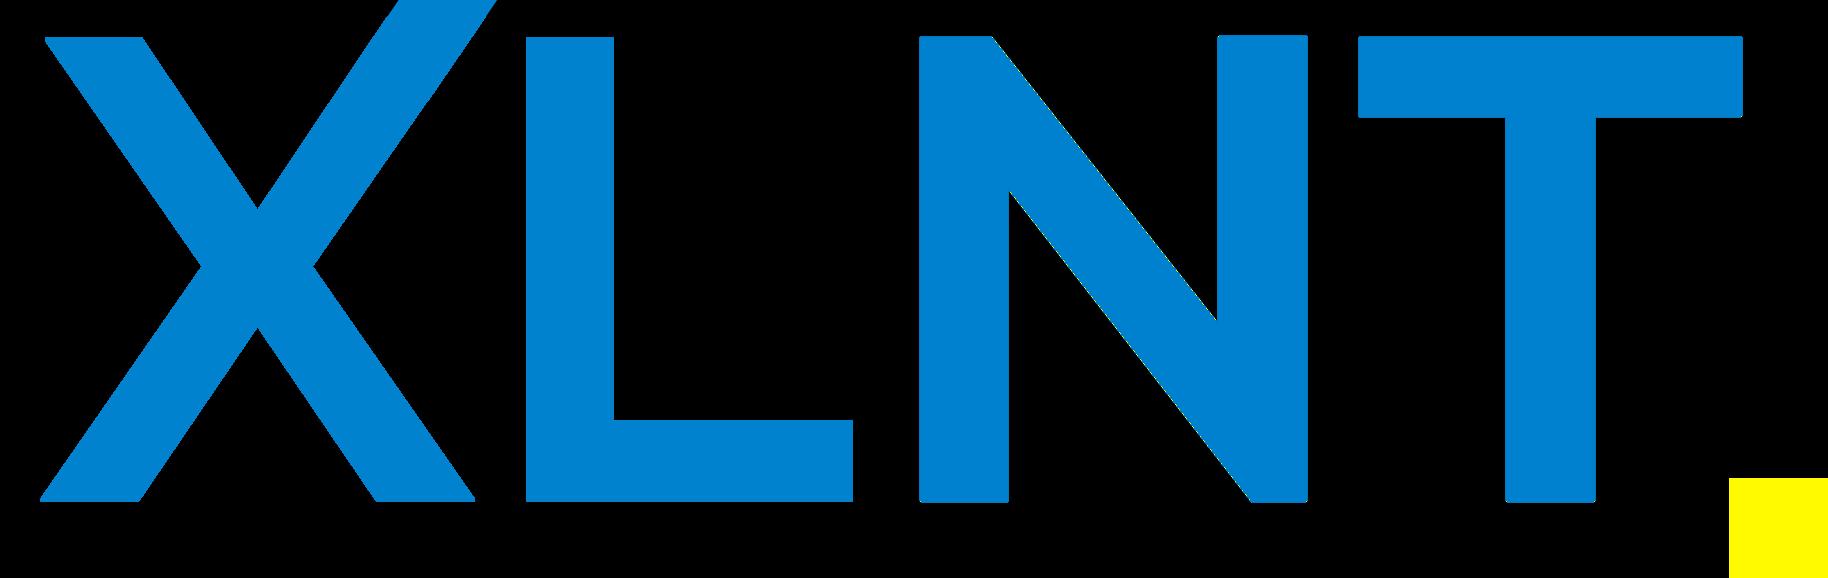 xlnt logo